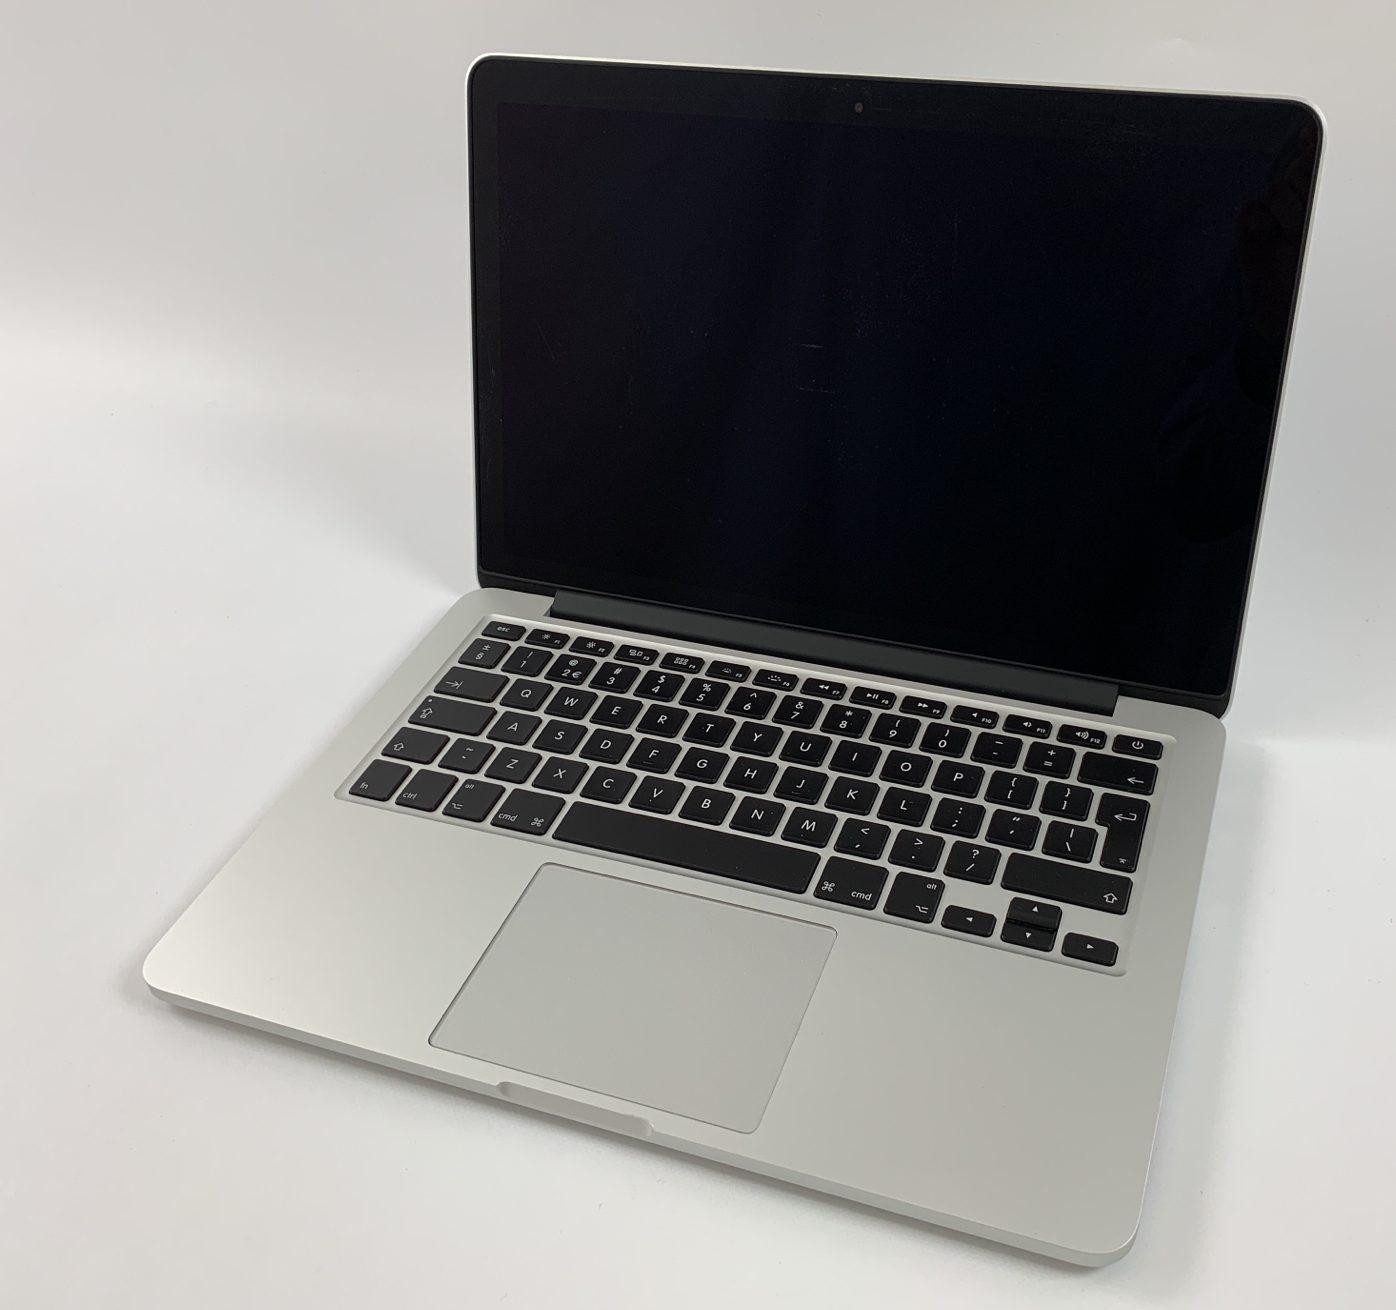 "MacBook Pro Retina 13"" Early 2015 (Intel Core i5 2.7 GHz 8 GB RAM 256 GB SSD), Intel Core i5 2.7 GHz, 8 GB RAM, 256 GB SSD, Afbeelding 1"